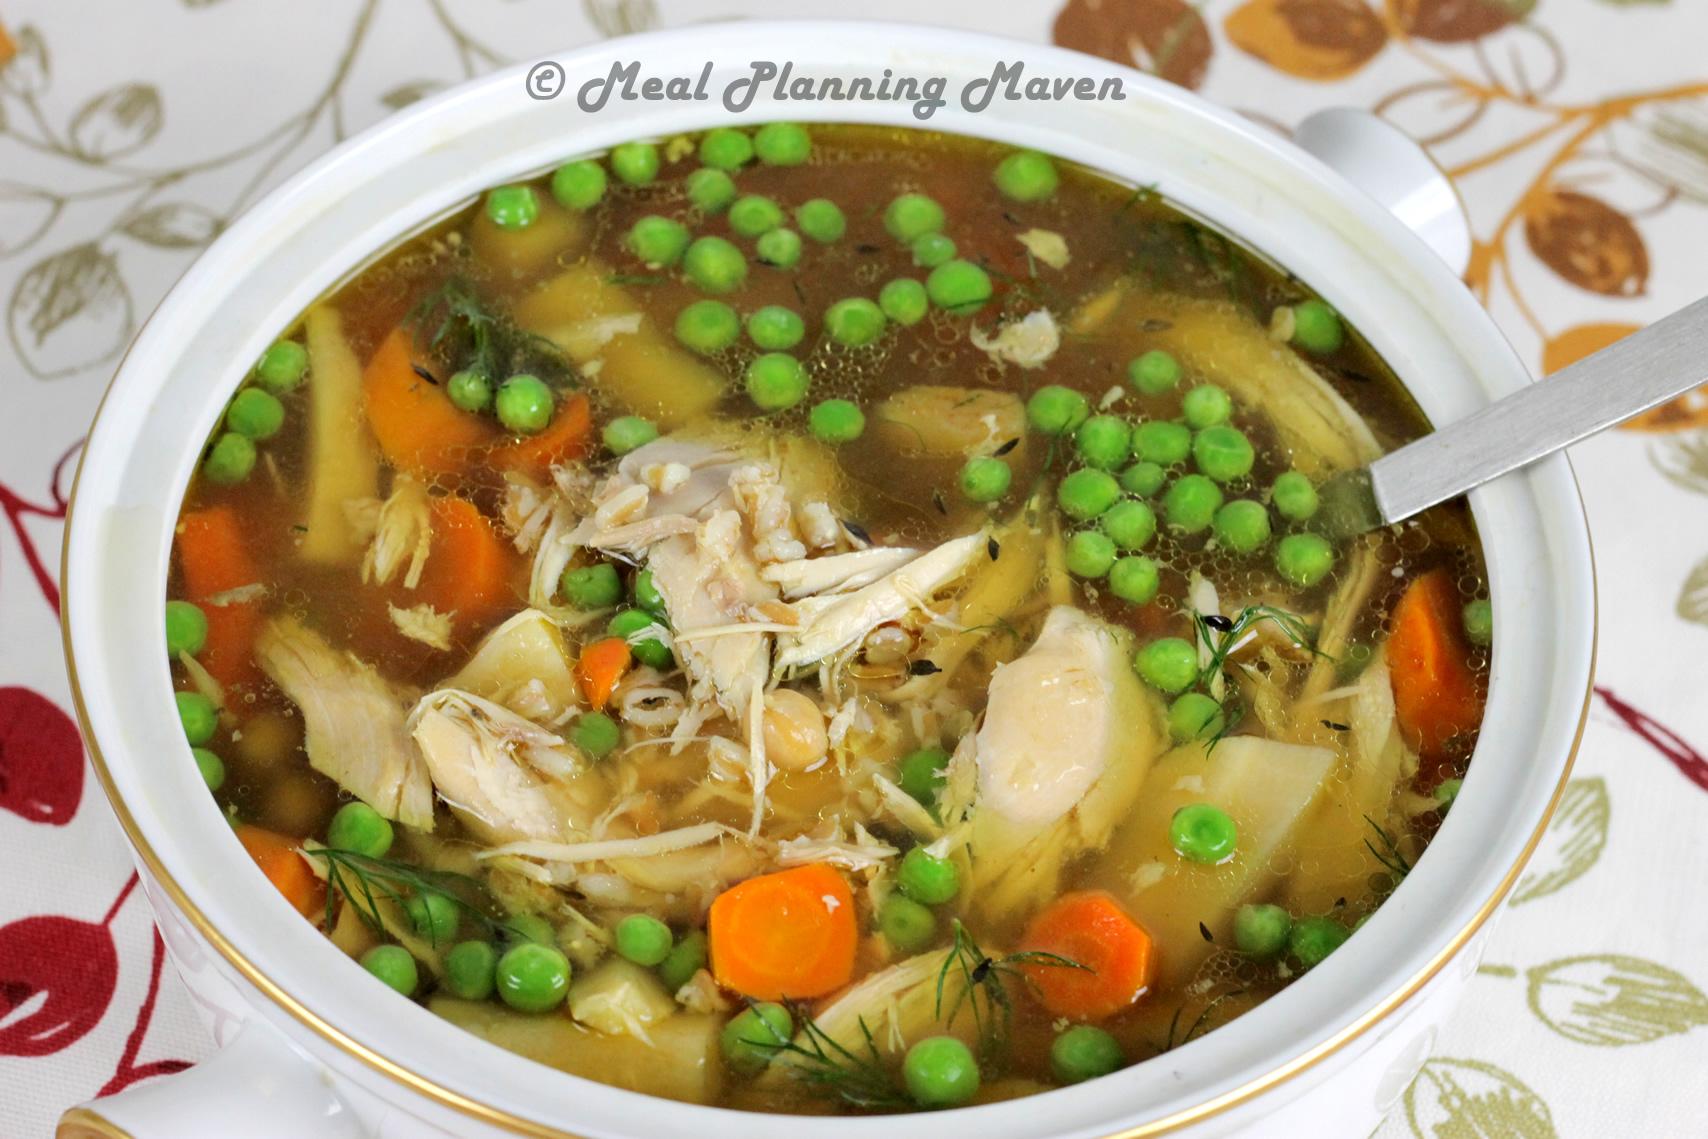 Crockpot Rustic Chicken Soup